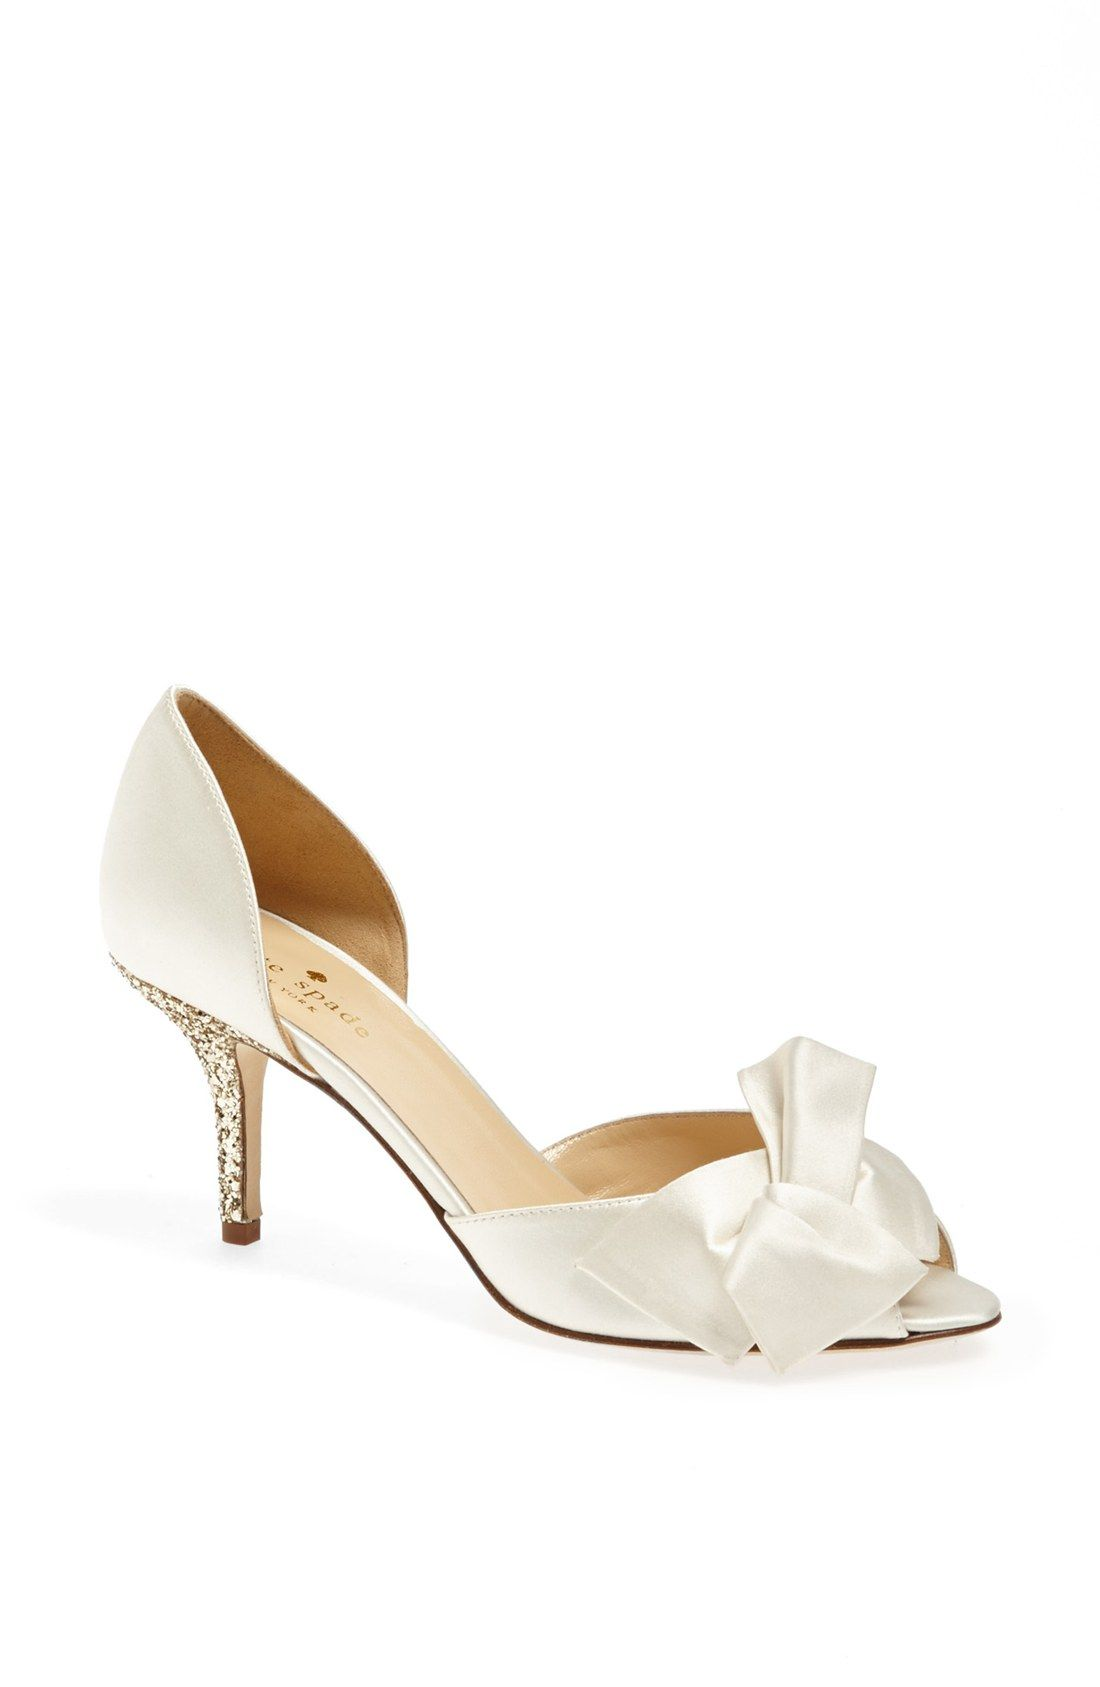 Kate Spade New York Sala Pump Women Available At Nordstrom Kate Spade New York  E2 99 A4 Wedding Shoes Kate Spade Bridal Shoes